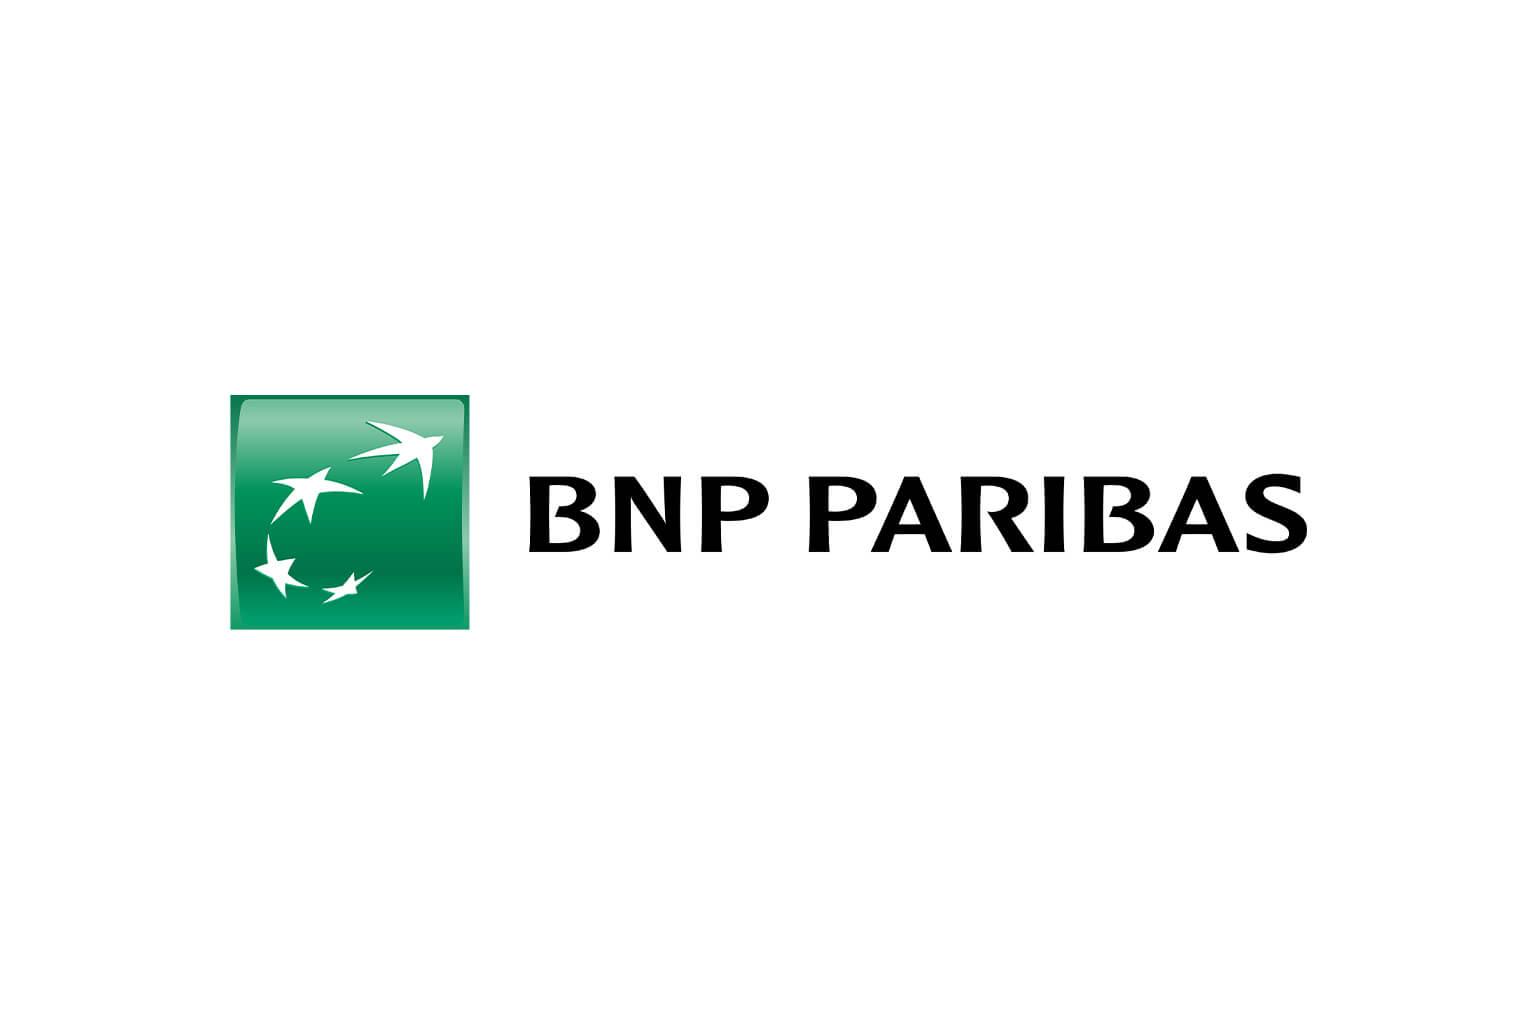 BNP Paribas Image